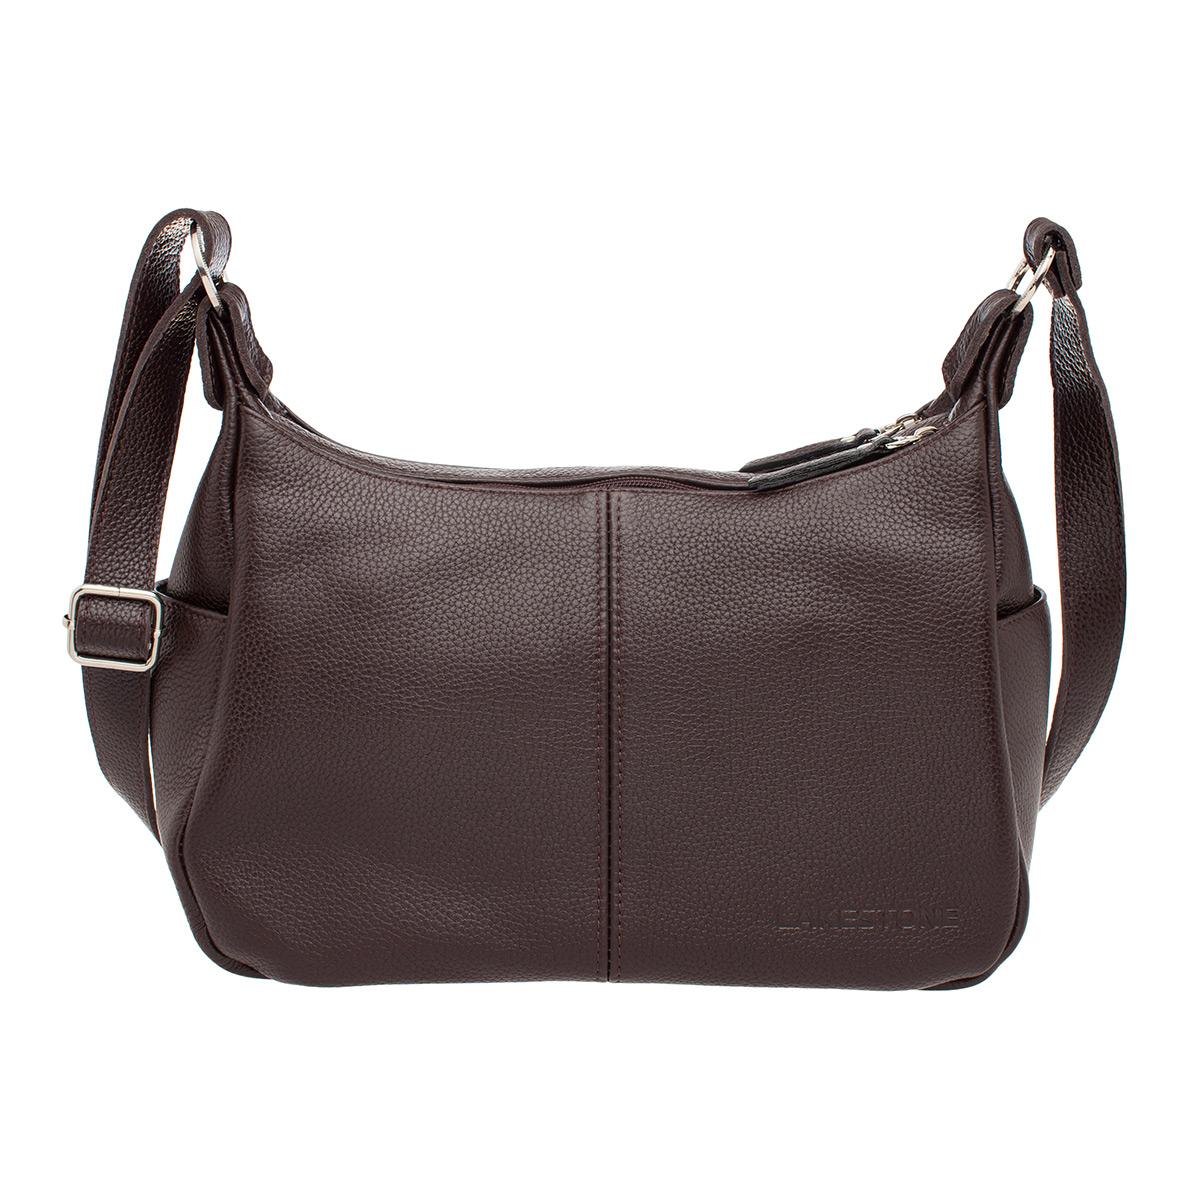 Кожаная сумка через плечо Tracey Brown фото